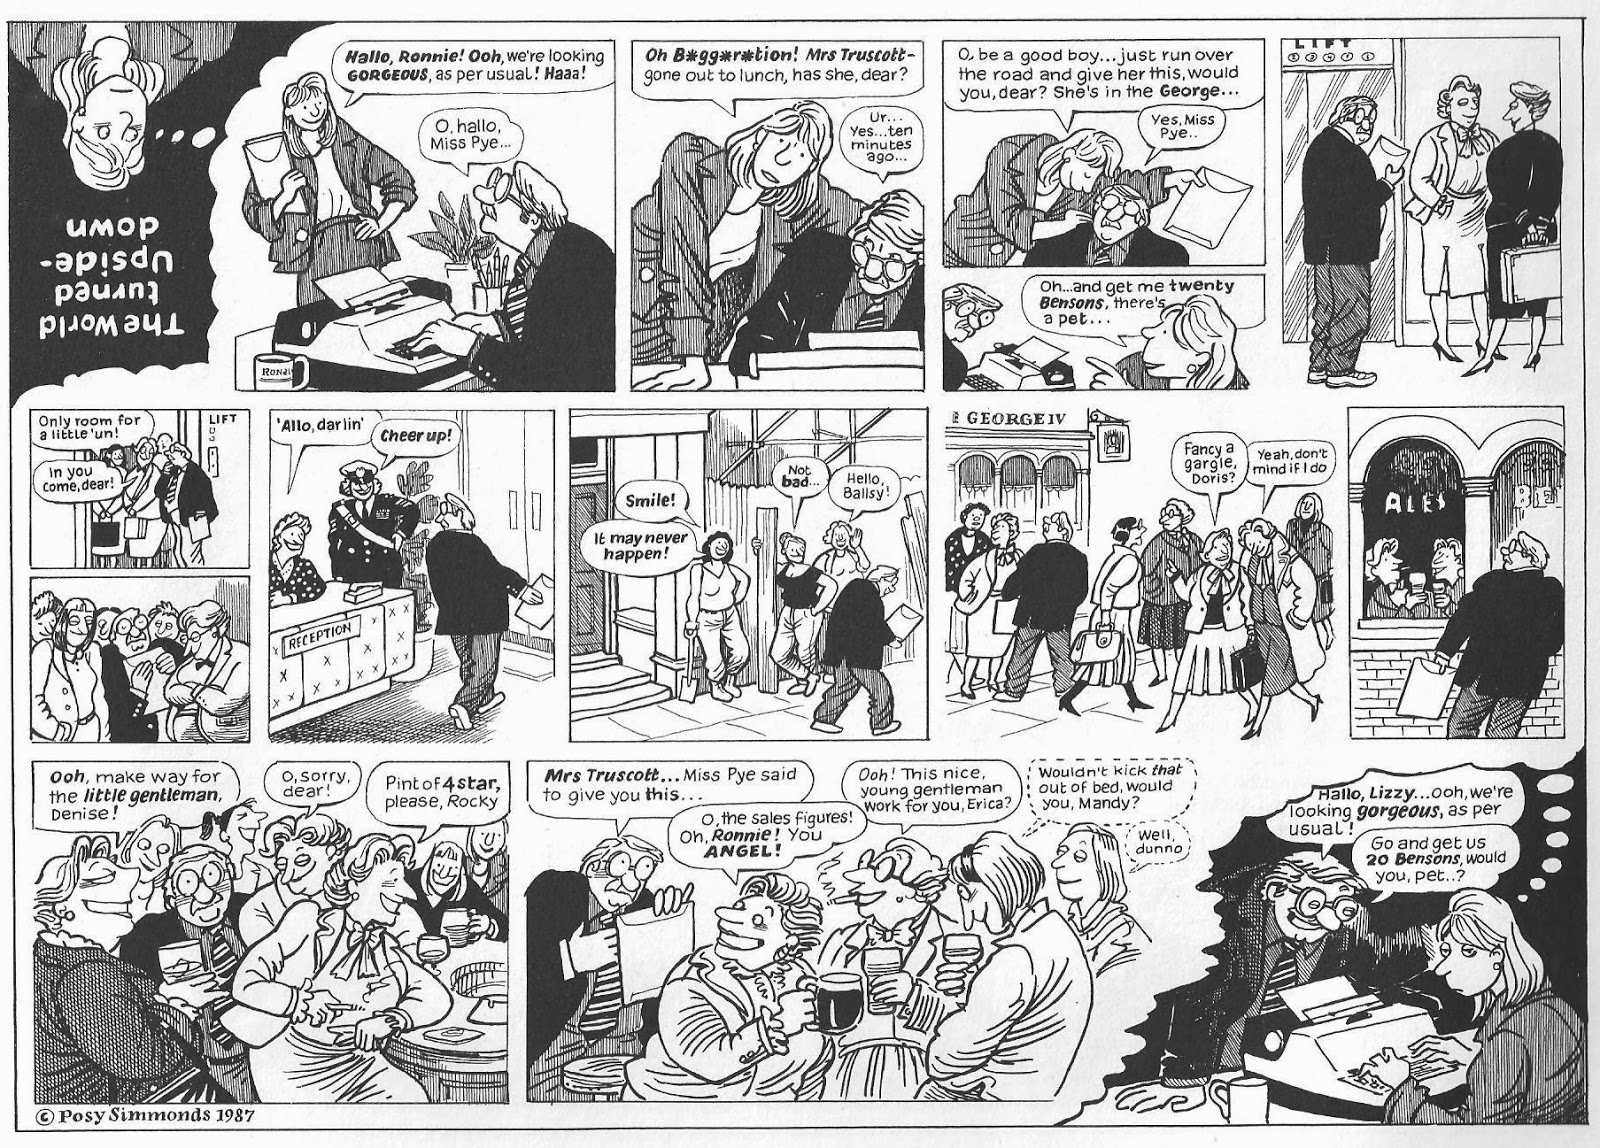 sunday comics debt: comic news summaries